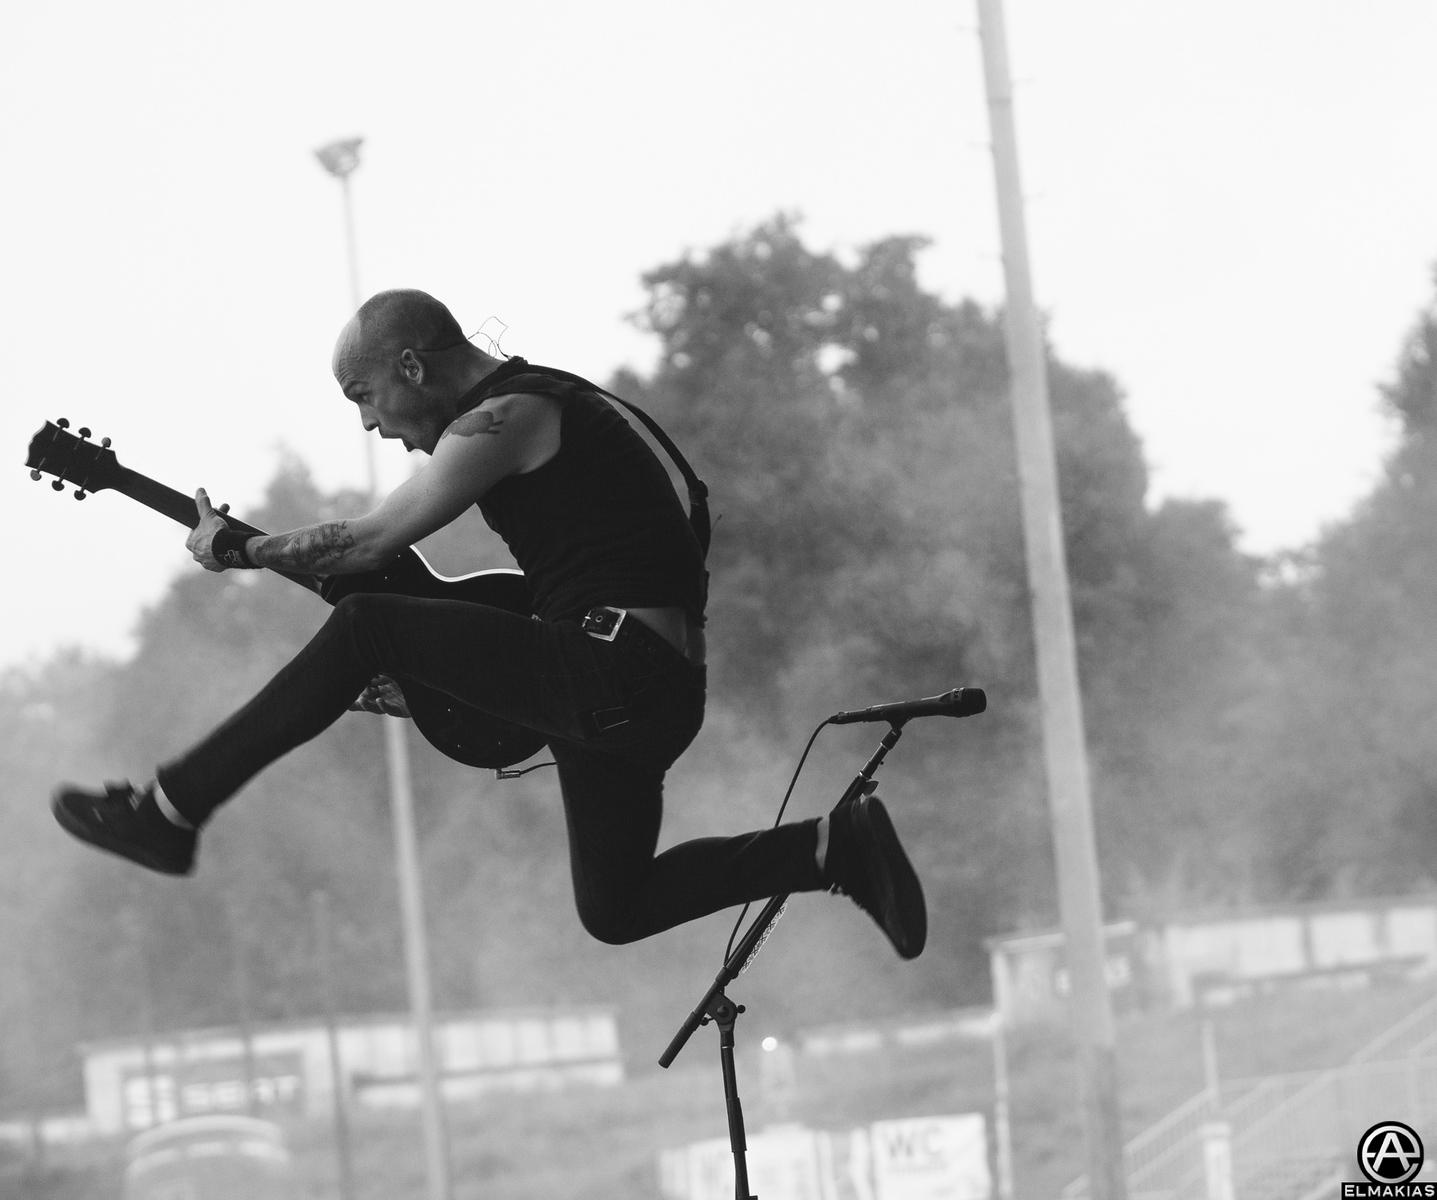 Zach Blair of Rise Against at Rock IM Park 2015 in Mendig, Germany - European Festivals